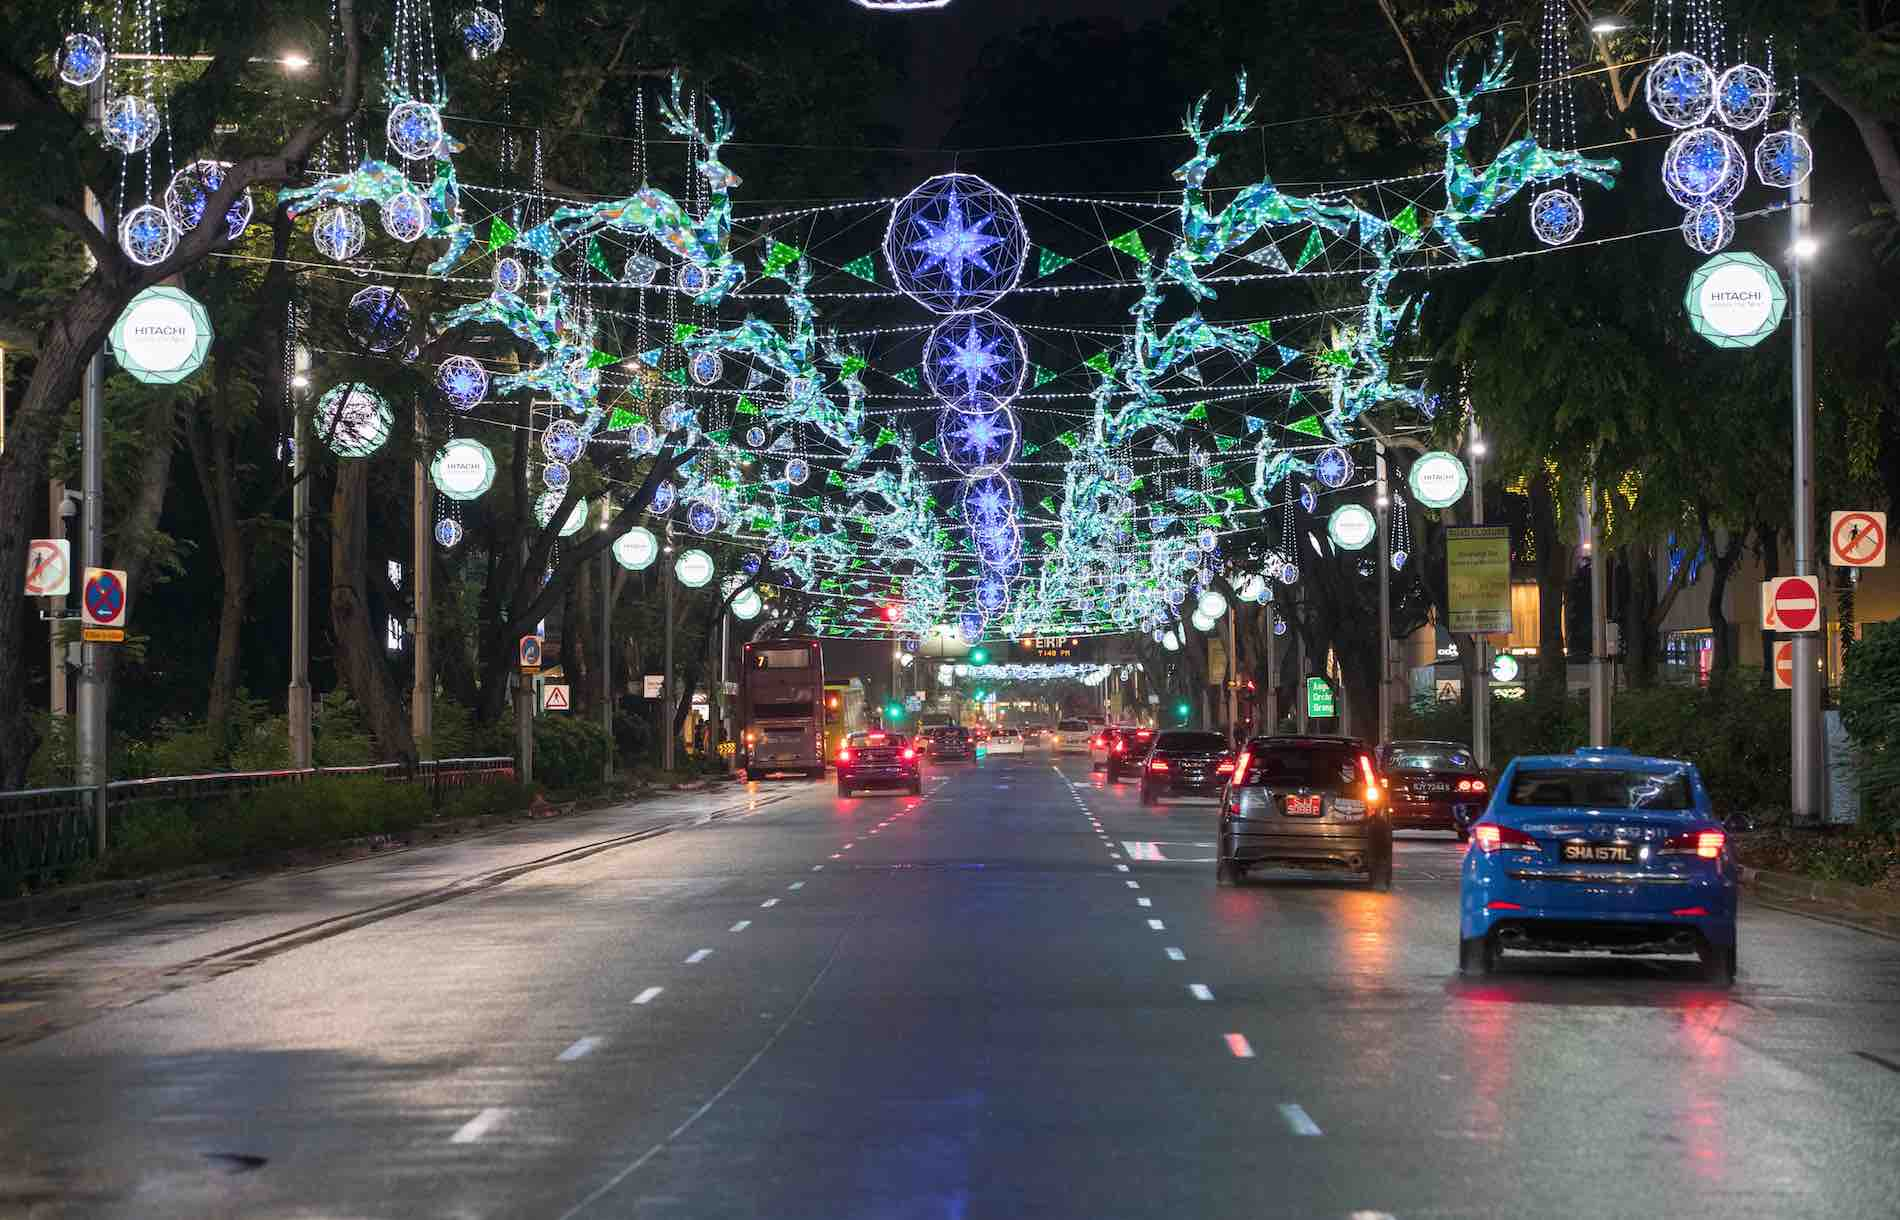 Orchard The Great Road Christmas Light Up 2016 AspirantSG royal albatross